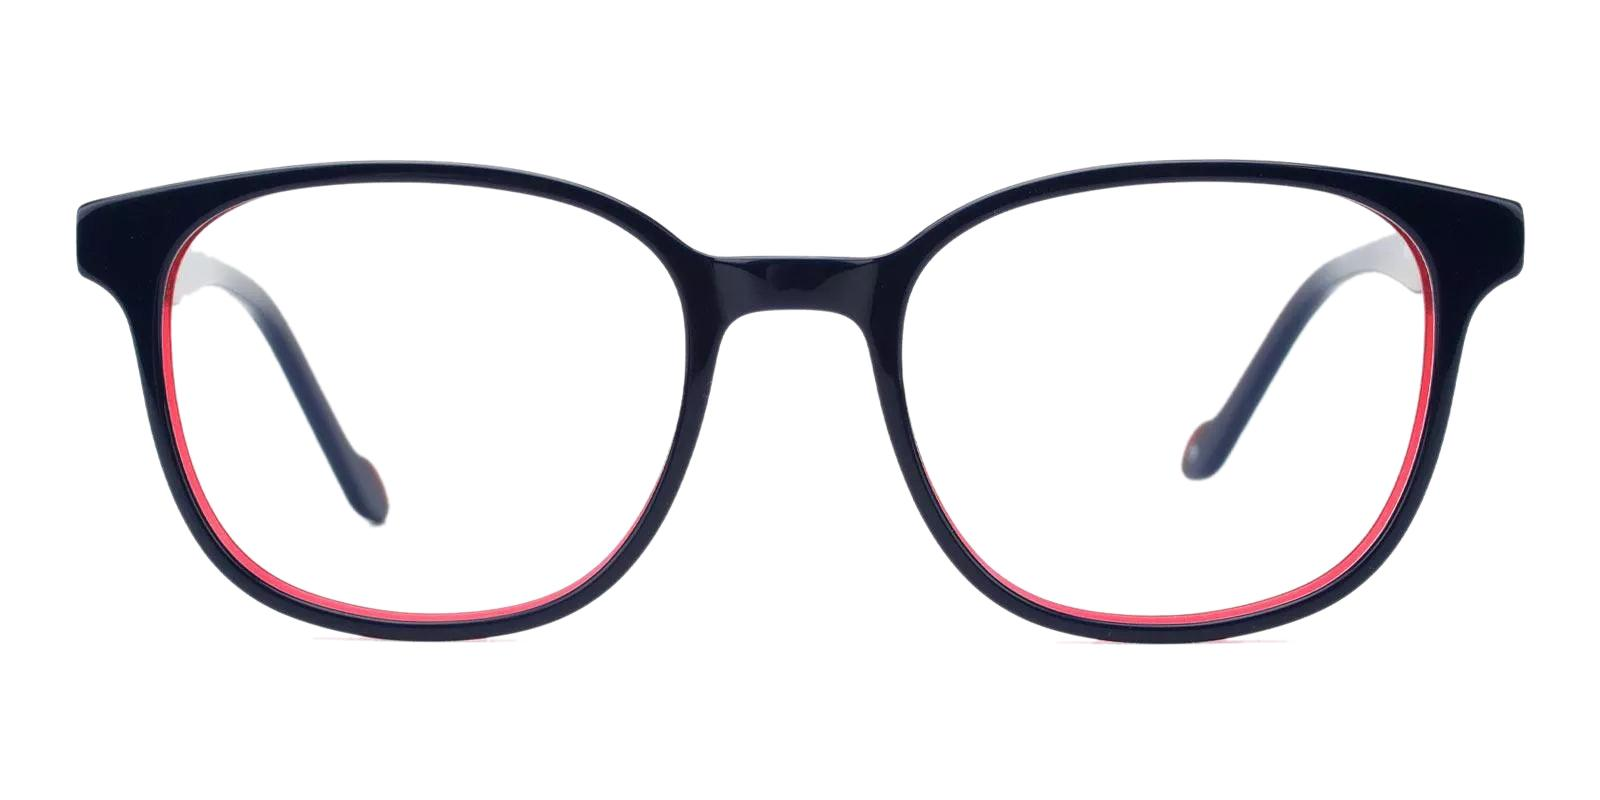 Marina Blue Acetate Eyeglasses , Fashion , SpringHinges , UniversalBridgeFit Frames from ABBE Glasses